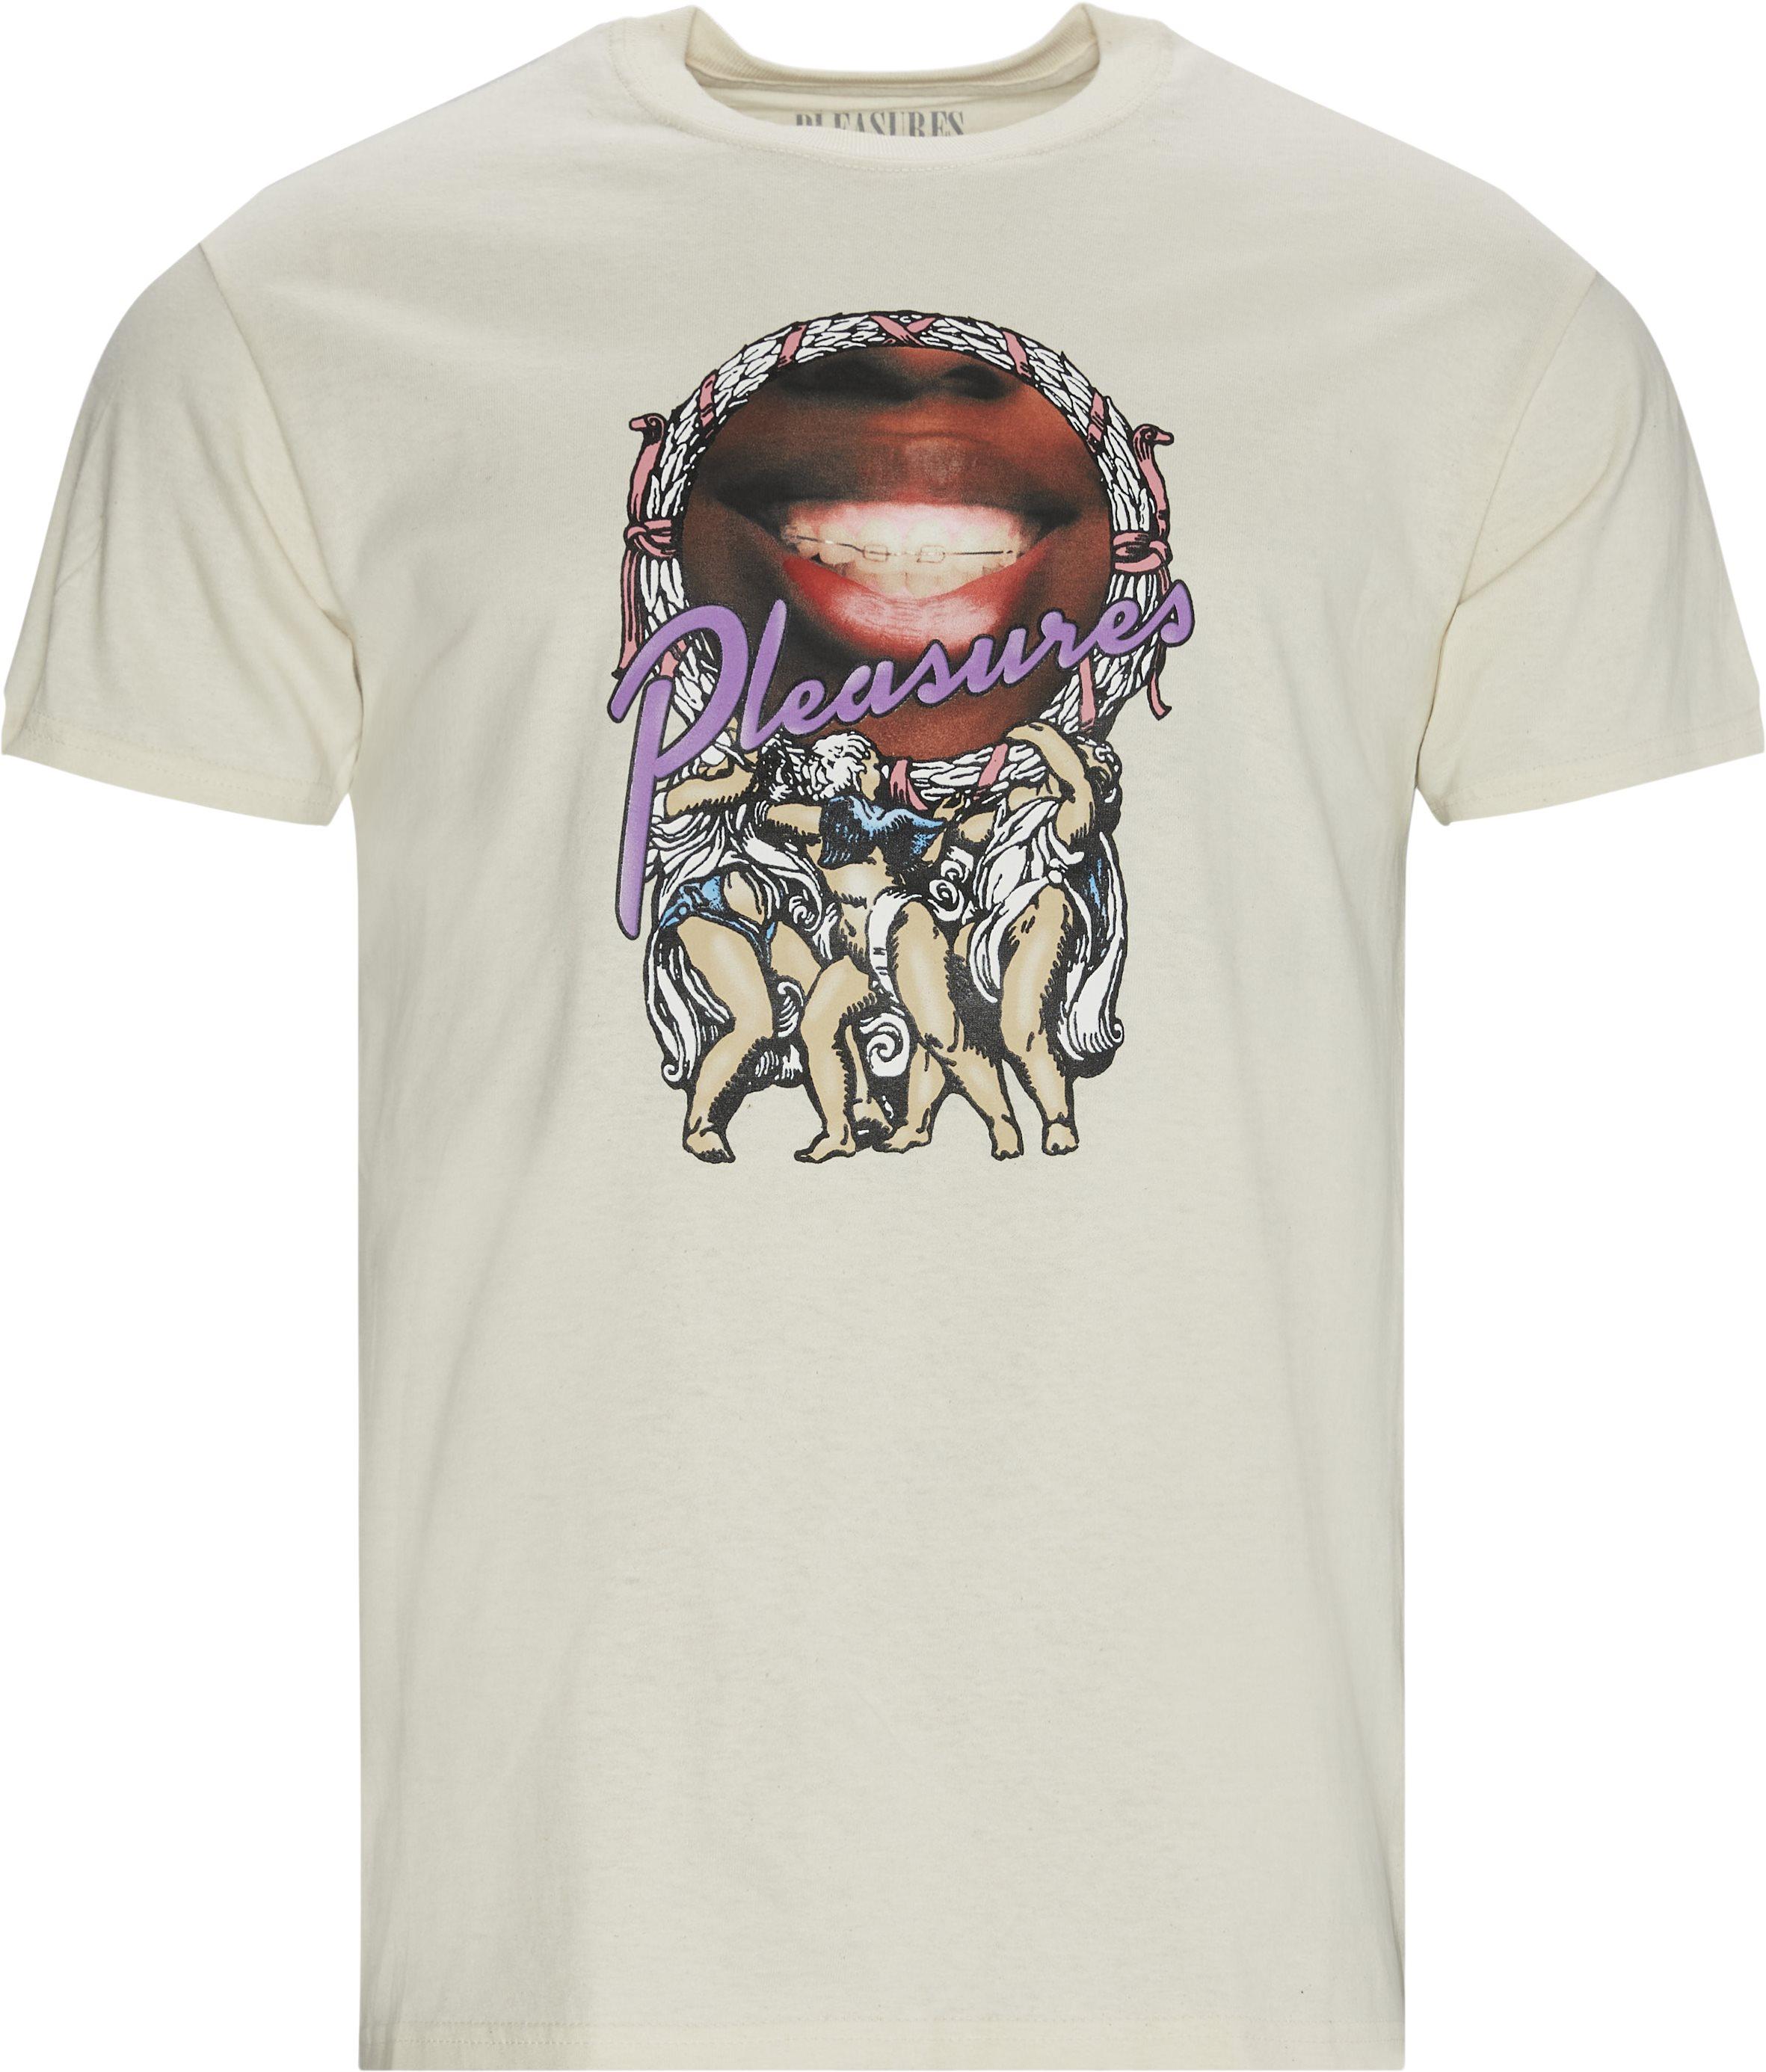 Goddess Tee - T-shirts - Regular - Sand